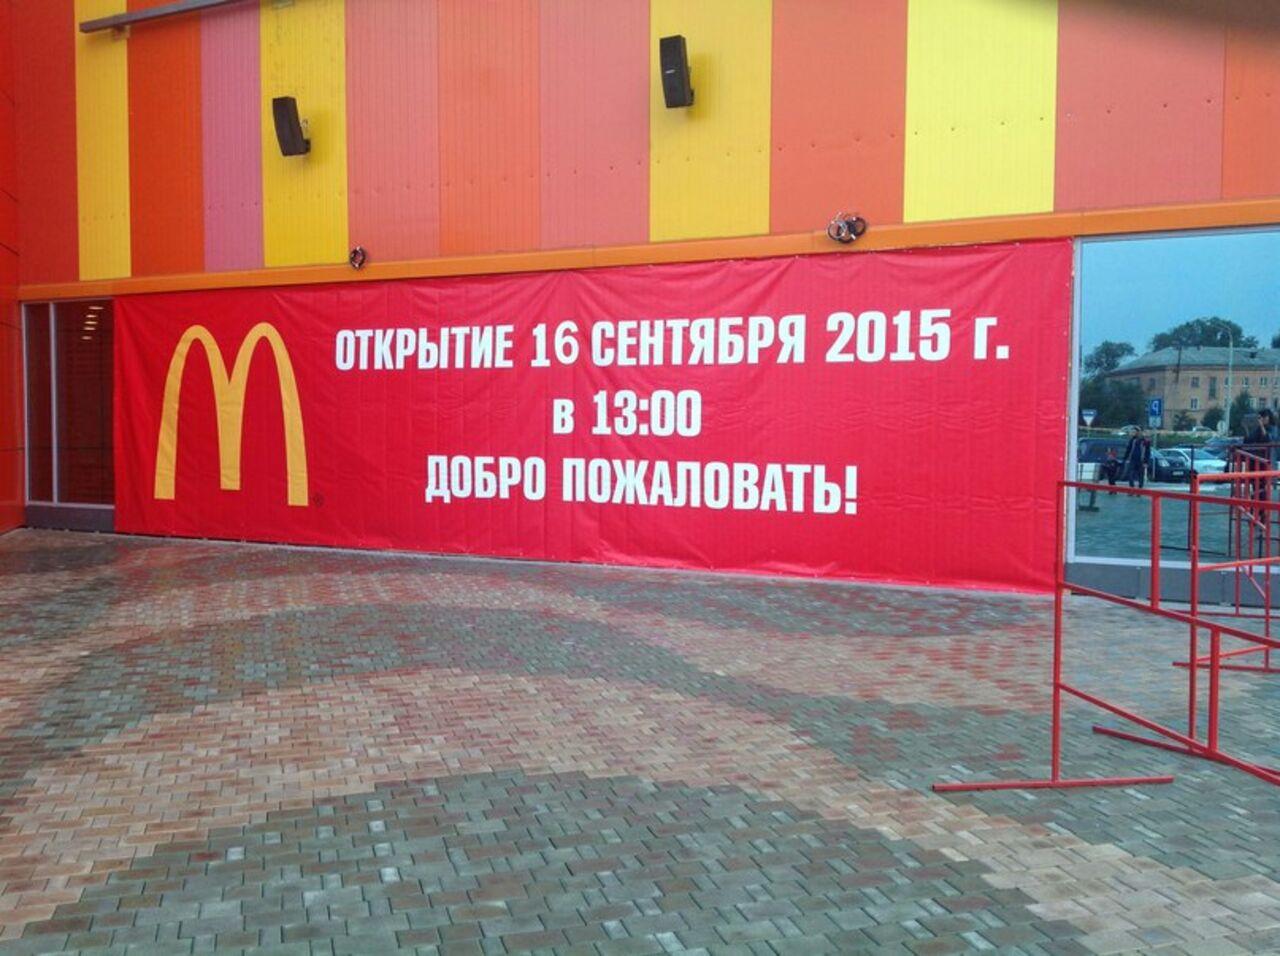 Работа в новокузнецке без прописки 14 фотография